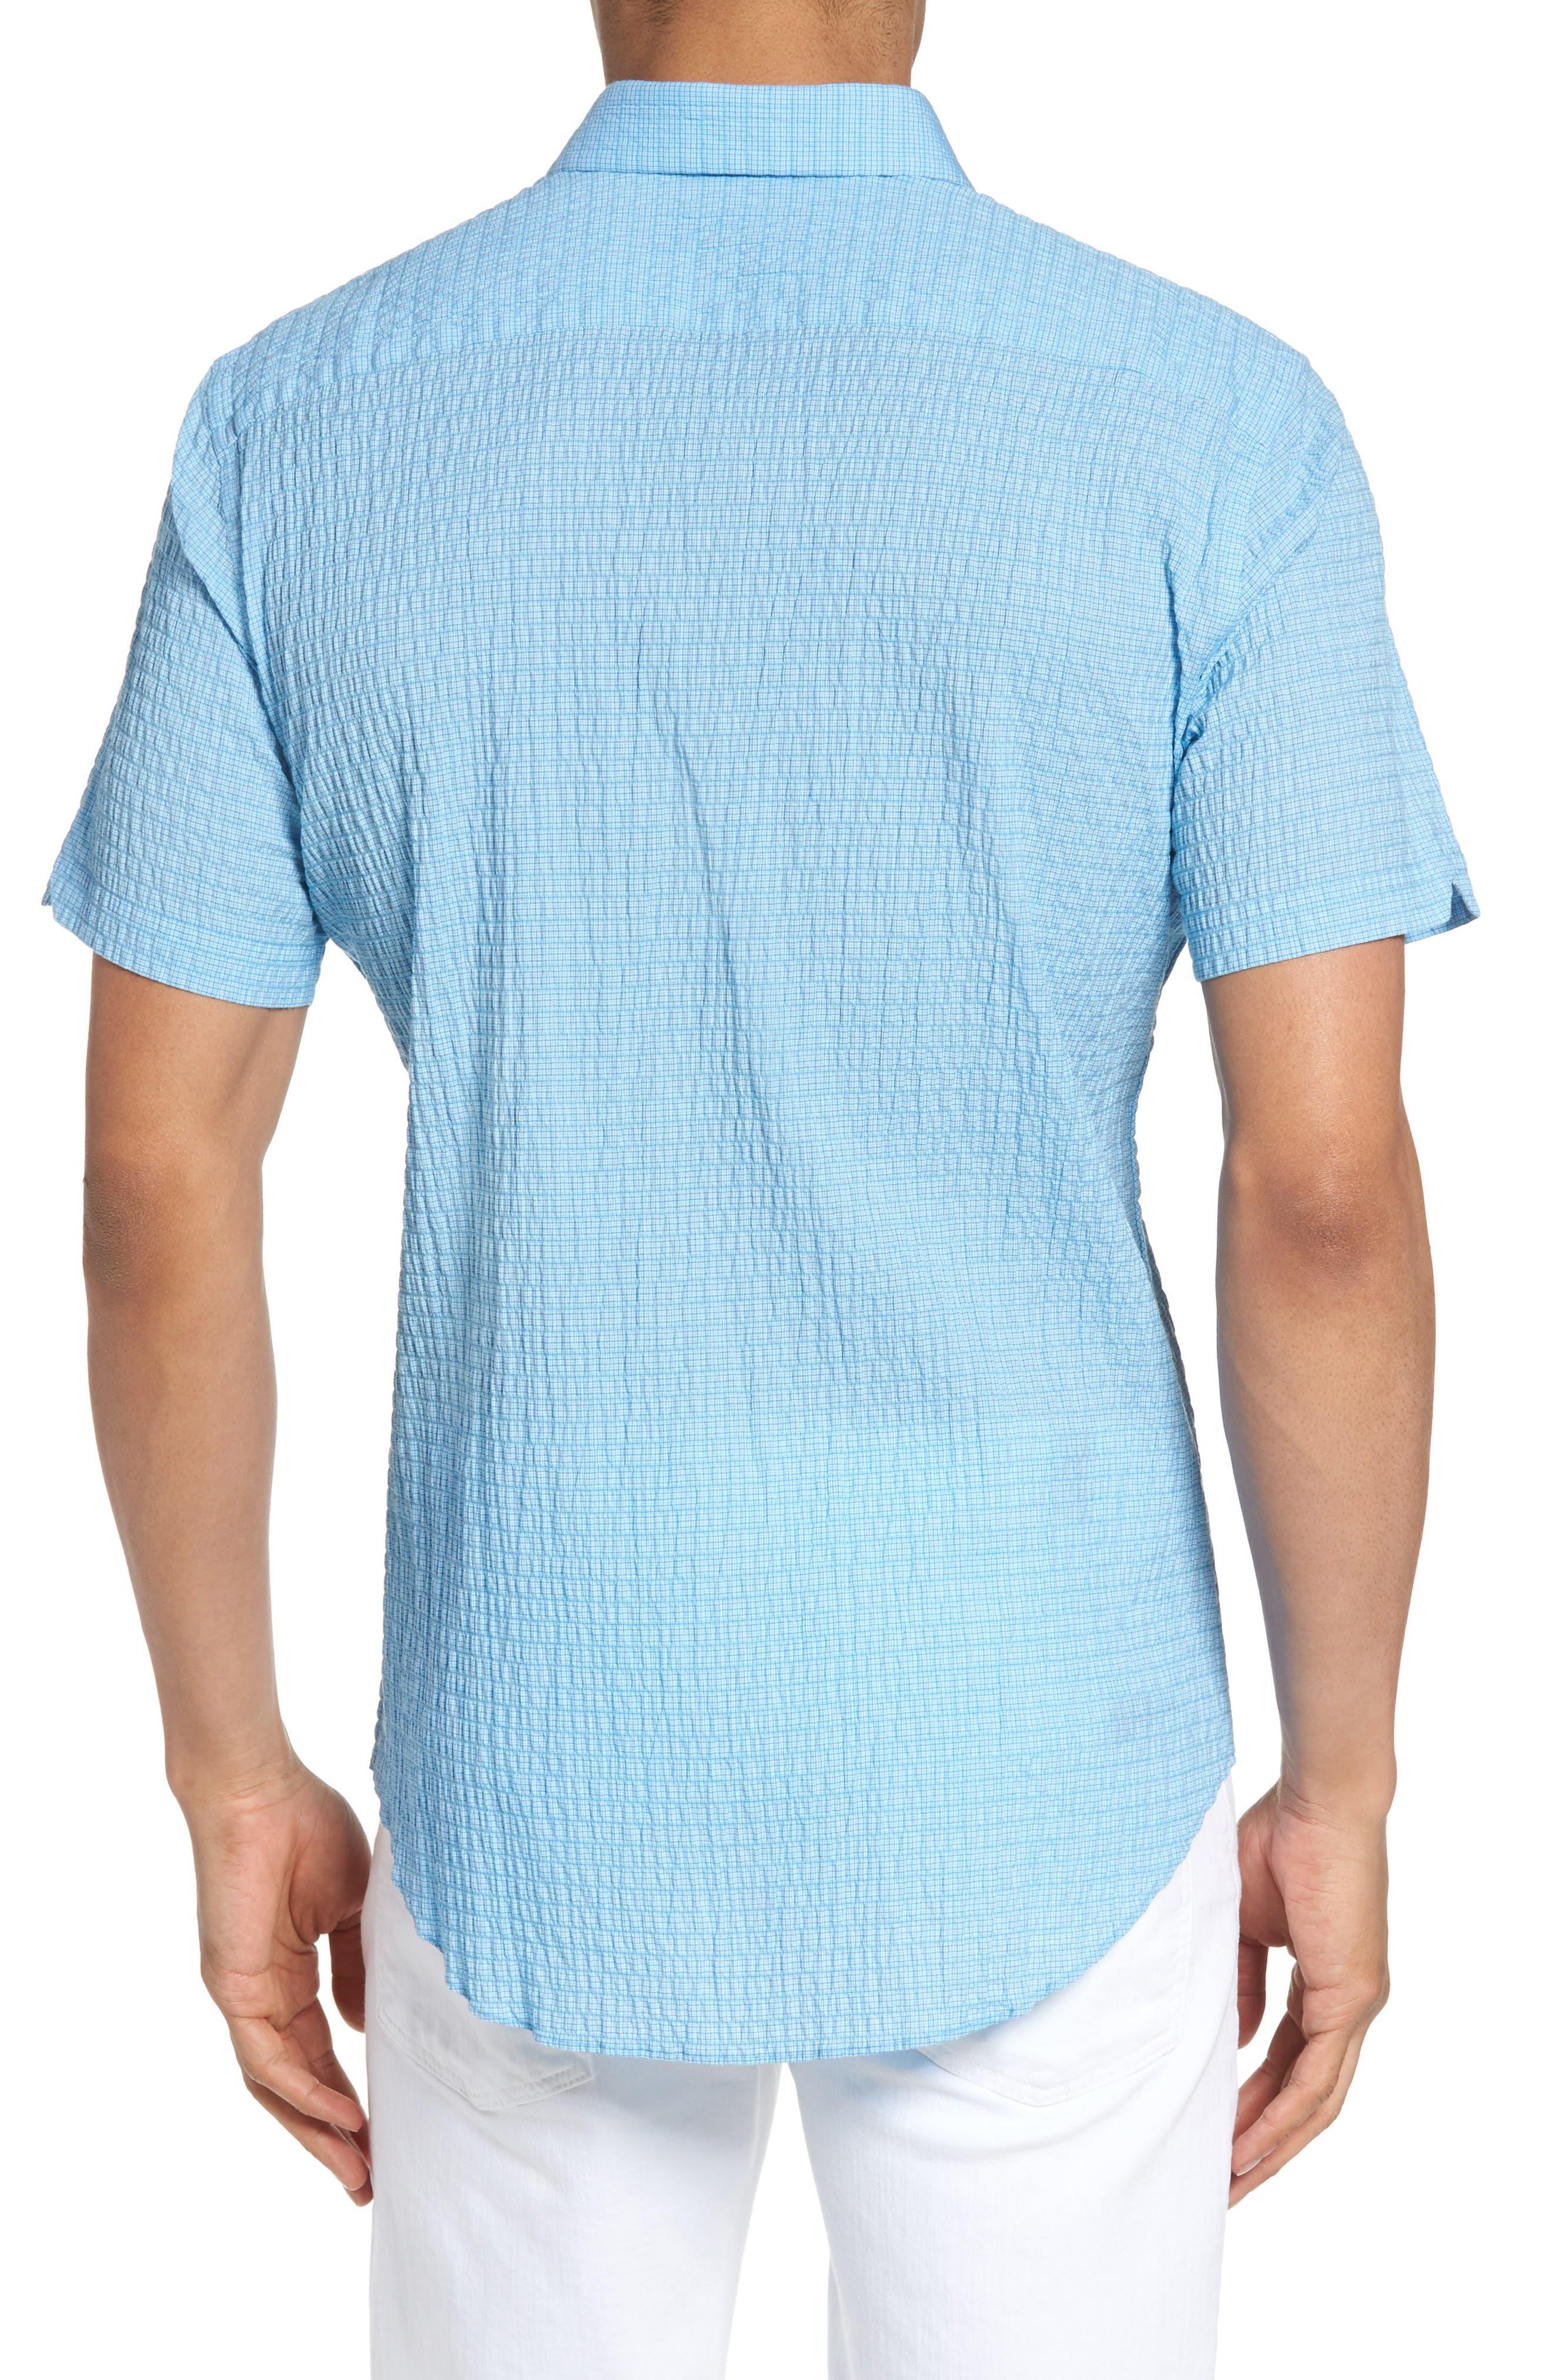 Morales Sport Shirt,                             Alternate thumbnail 2, color,                             Light Blue